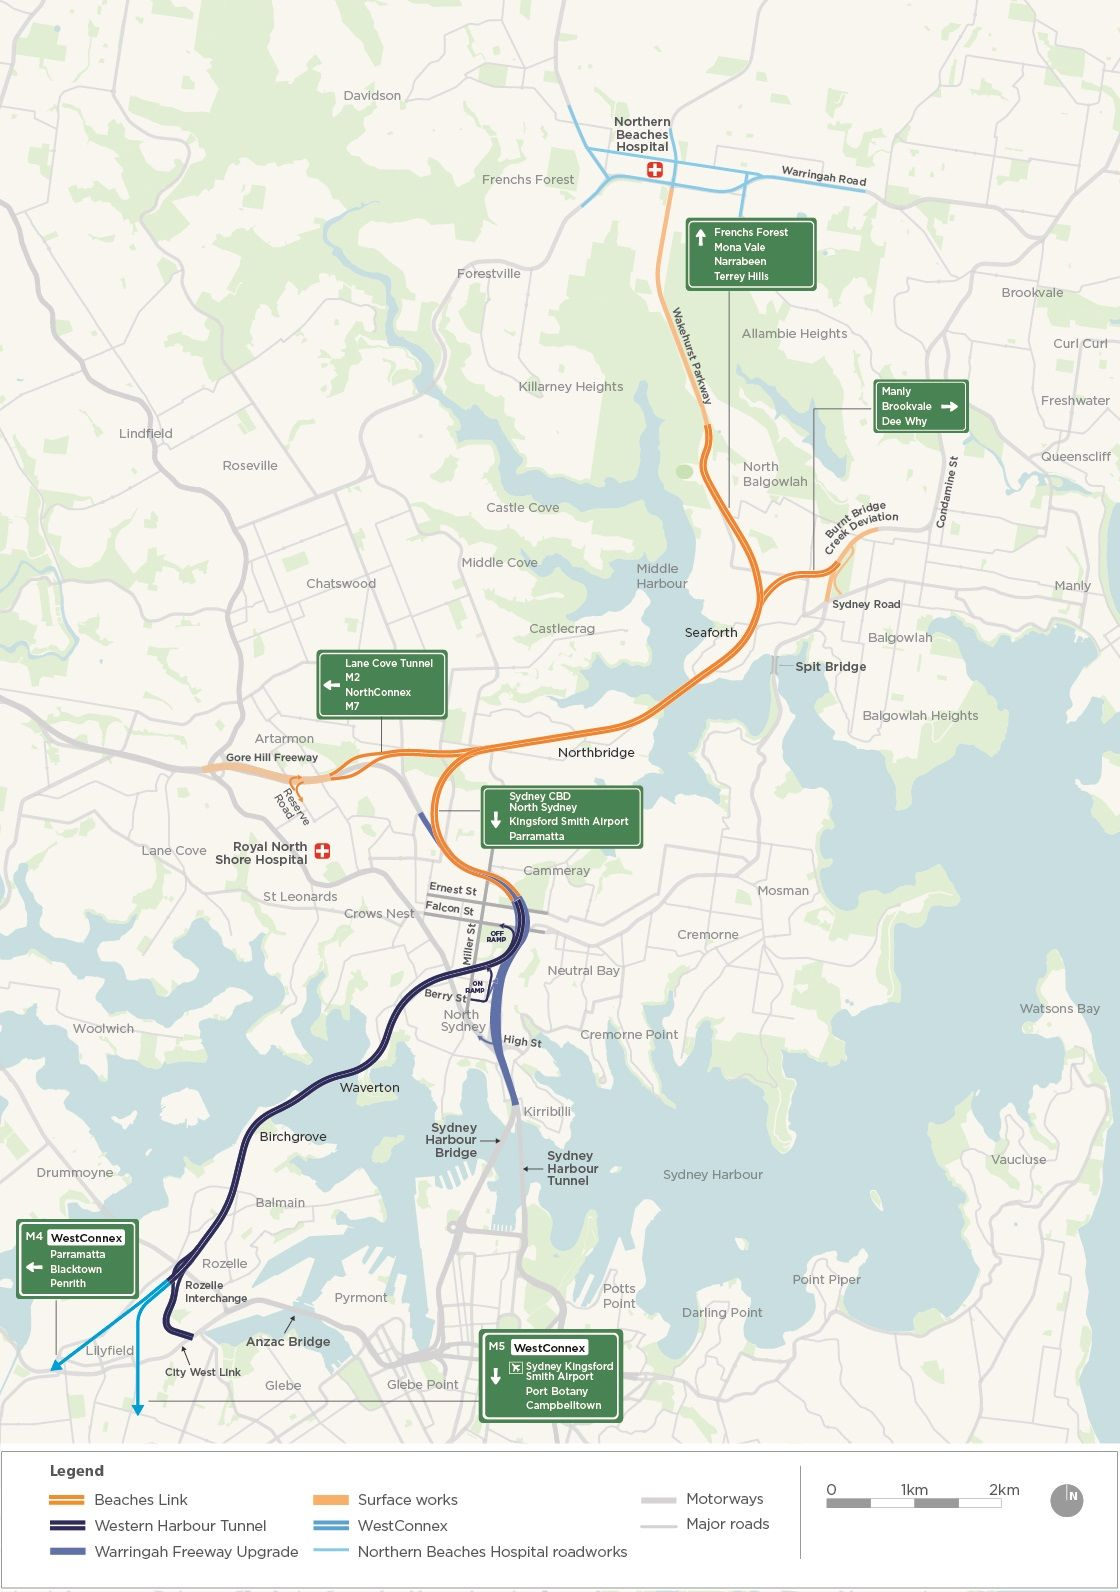 Shortlist for Western Harbour Tunnel: Bechtel, Jacobs &Laing O'Rourke